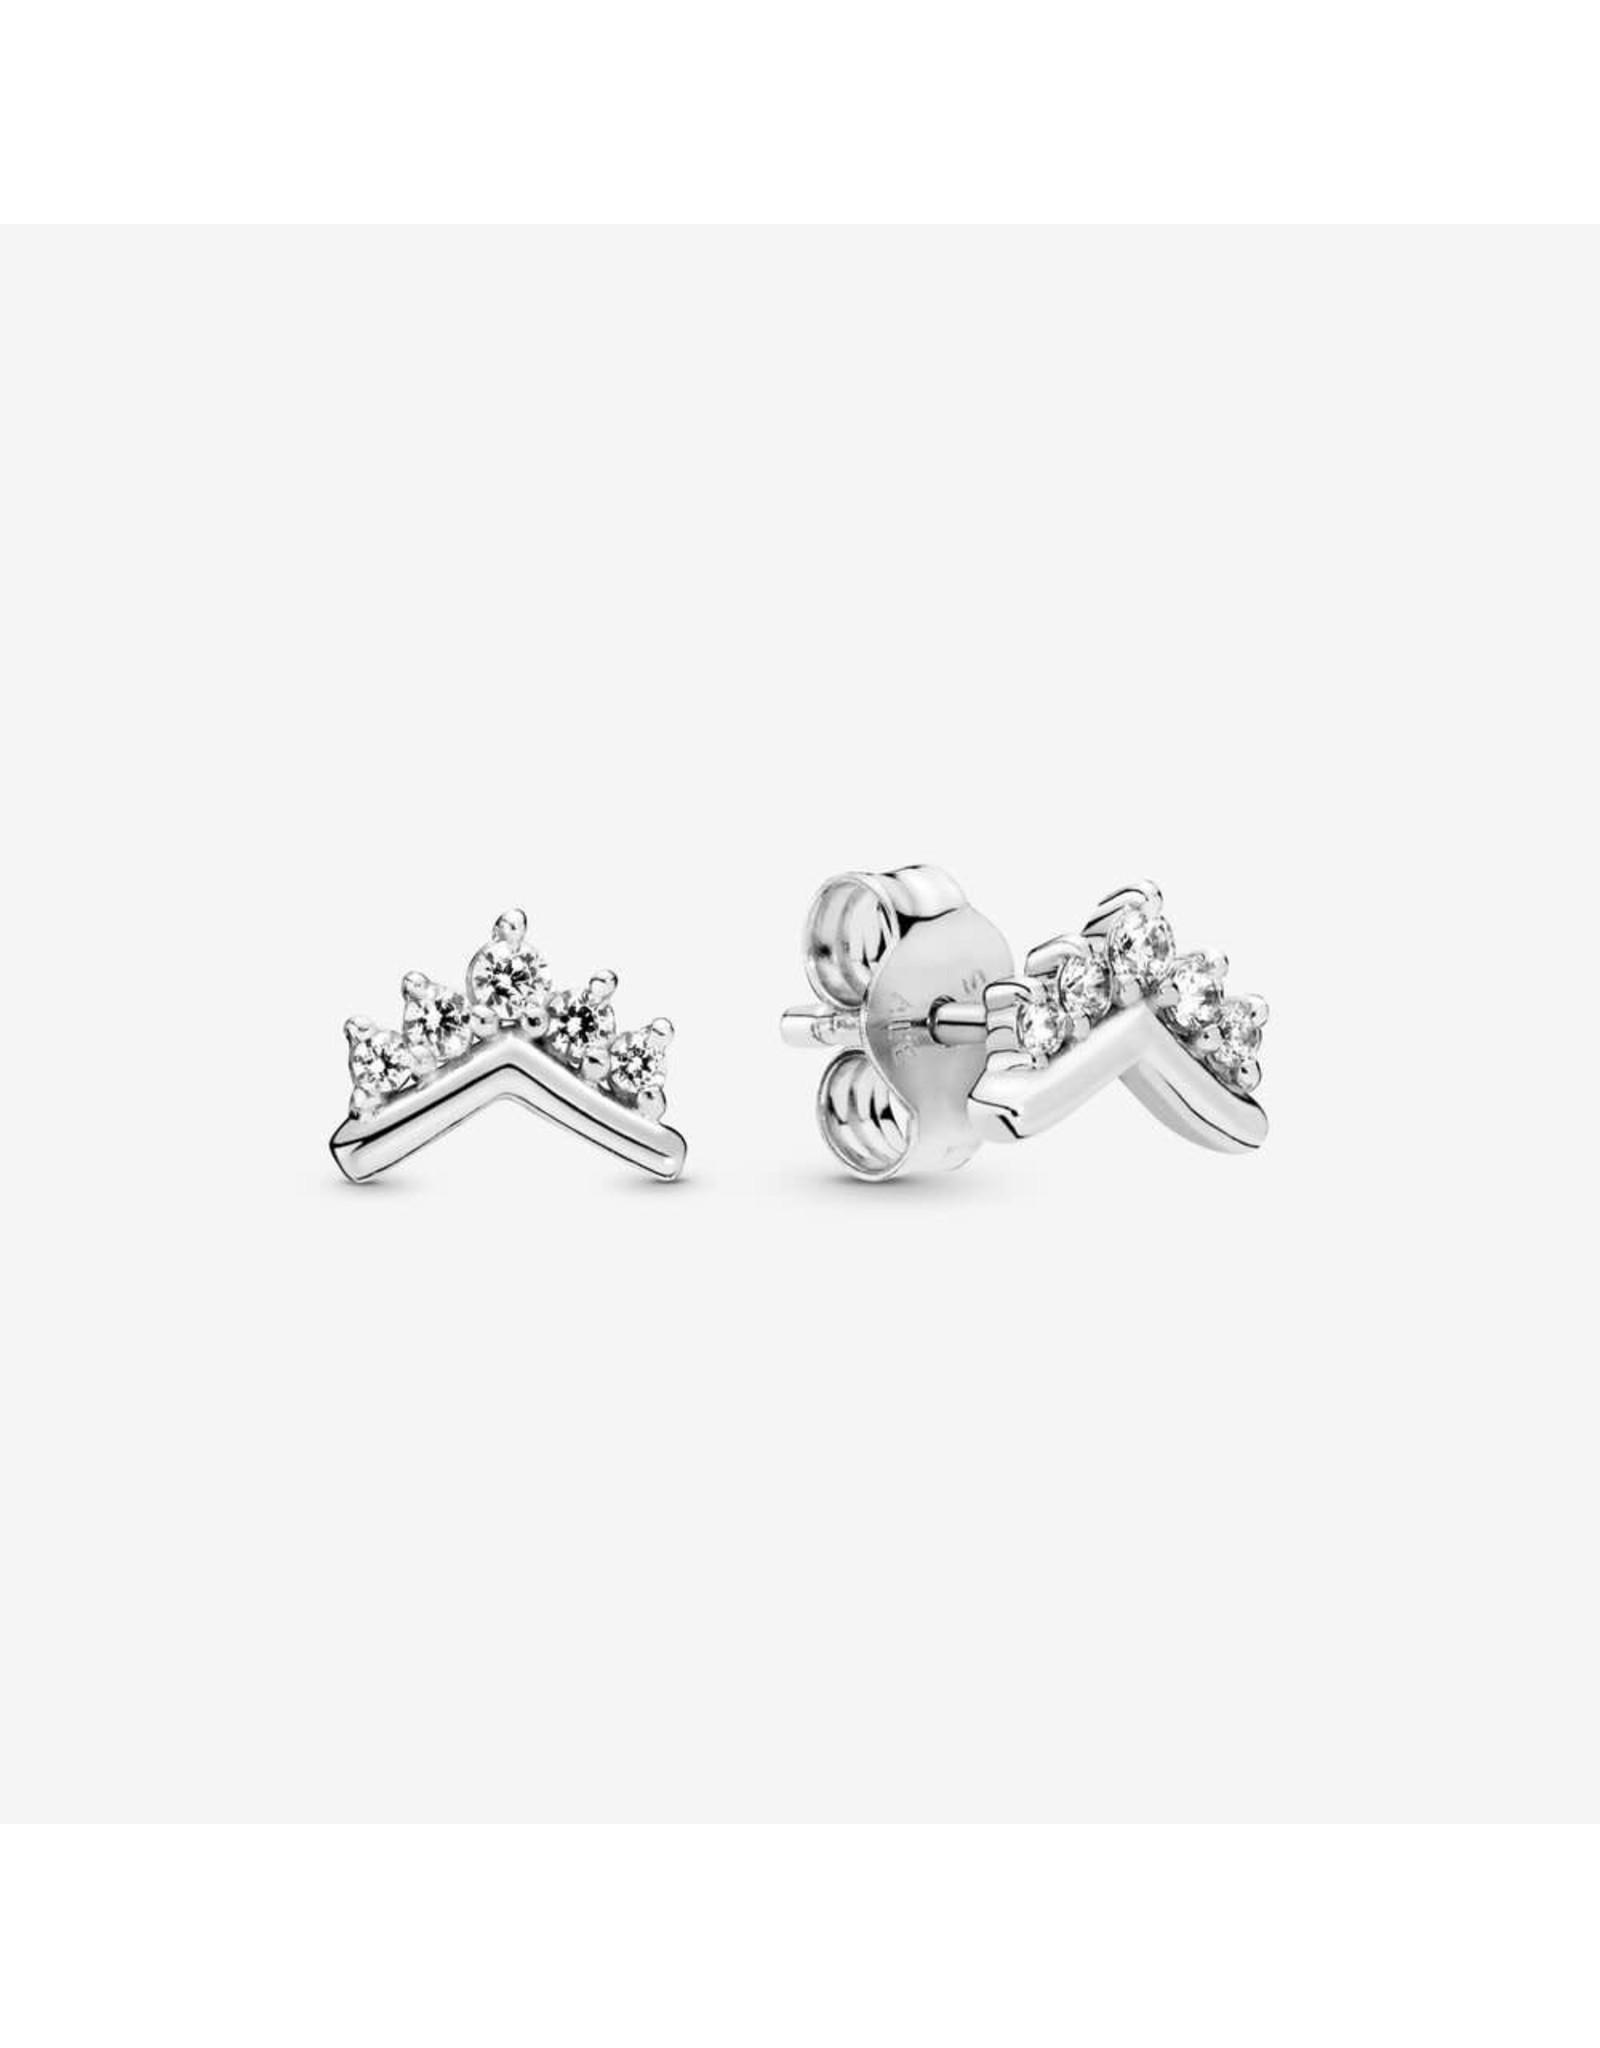 Pandora Pandora Tiara wishbone Sterling Silver Stud Earrings Clear CZ